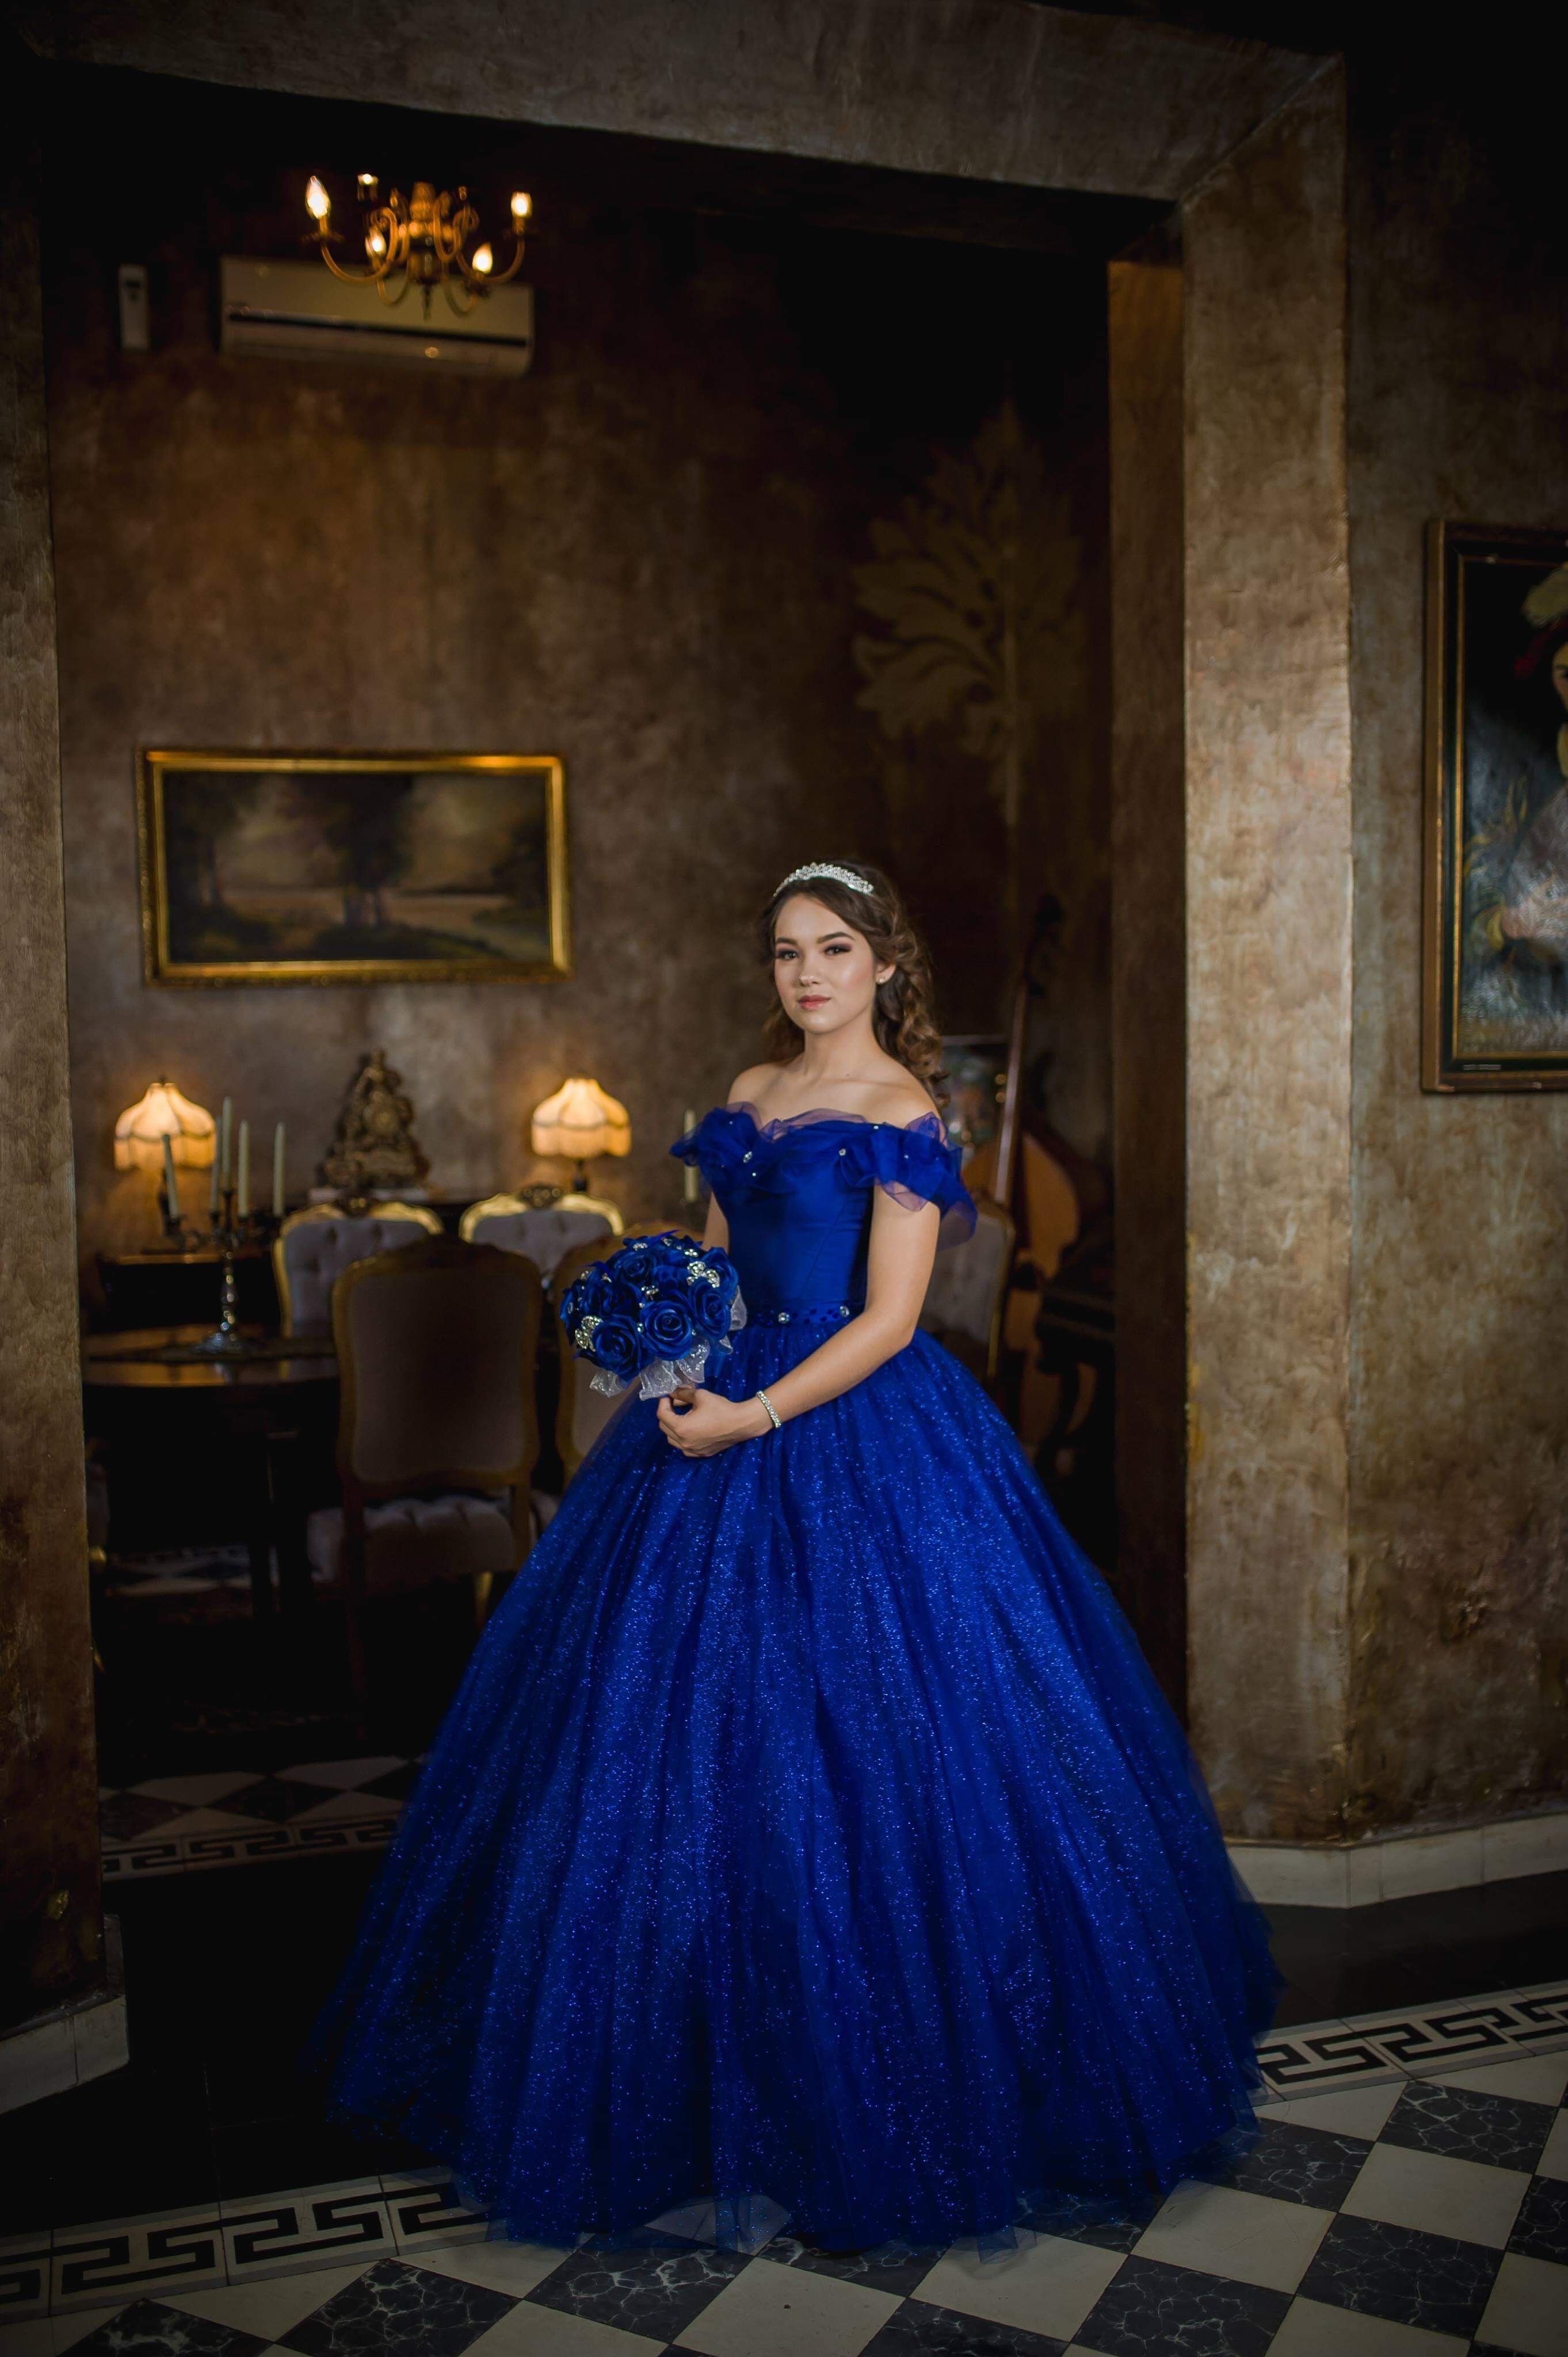 822617935 Vestido de xv, cenicienta #xvaños #cenicienta #vestidodeprincesa #azul # princesas